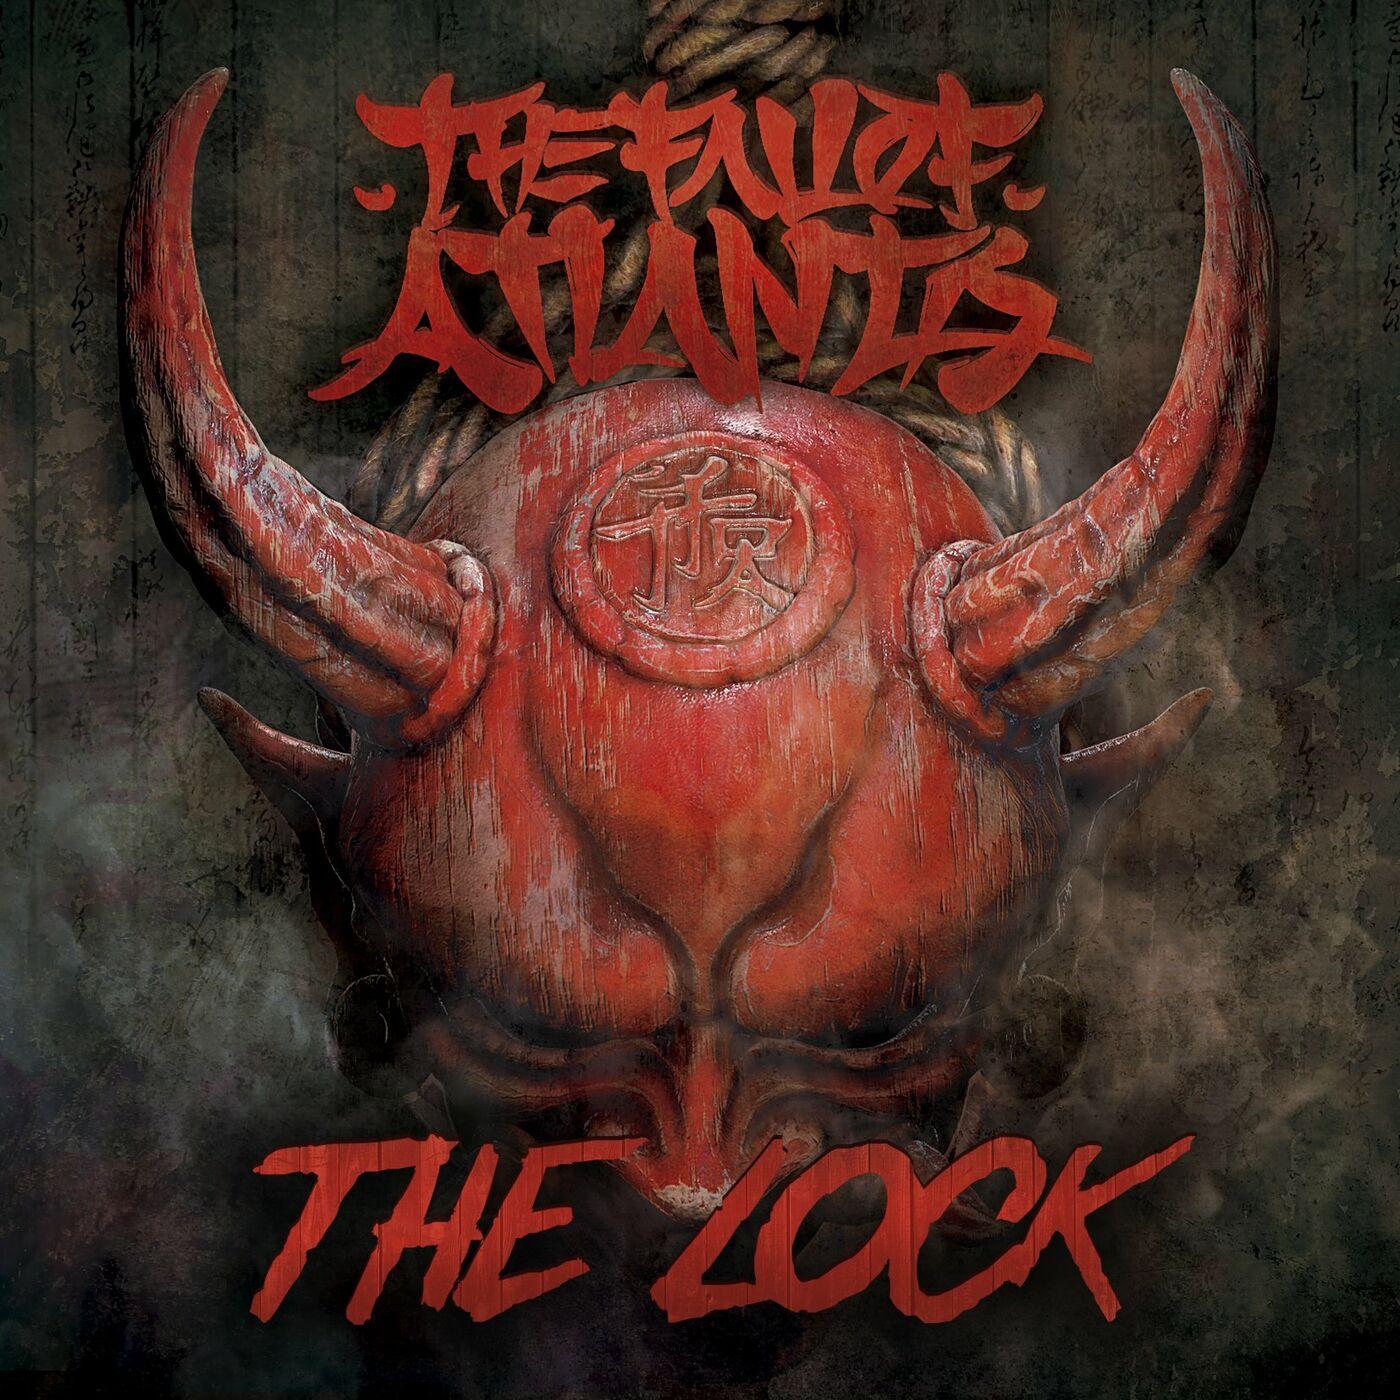 The Fall of Atlantis - The Lock [single] (2020)